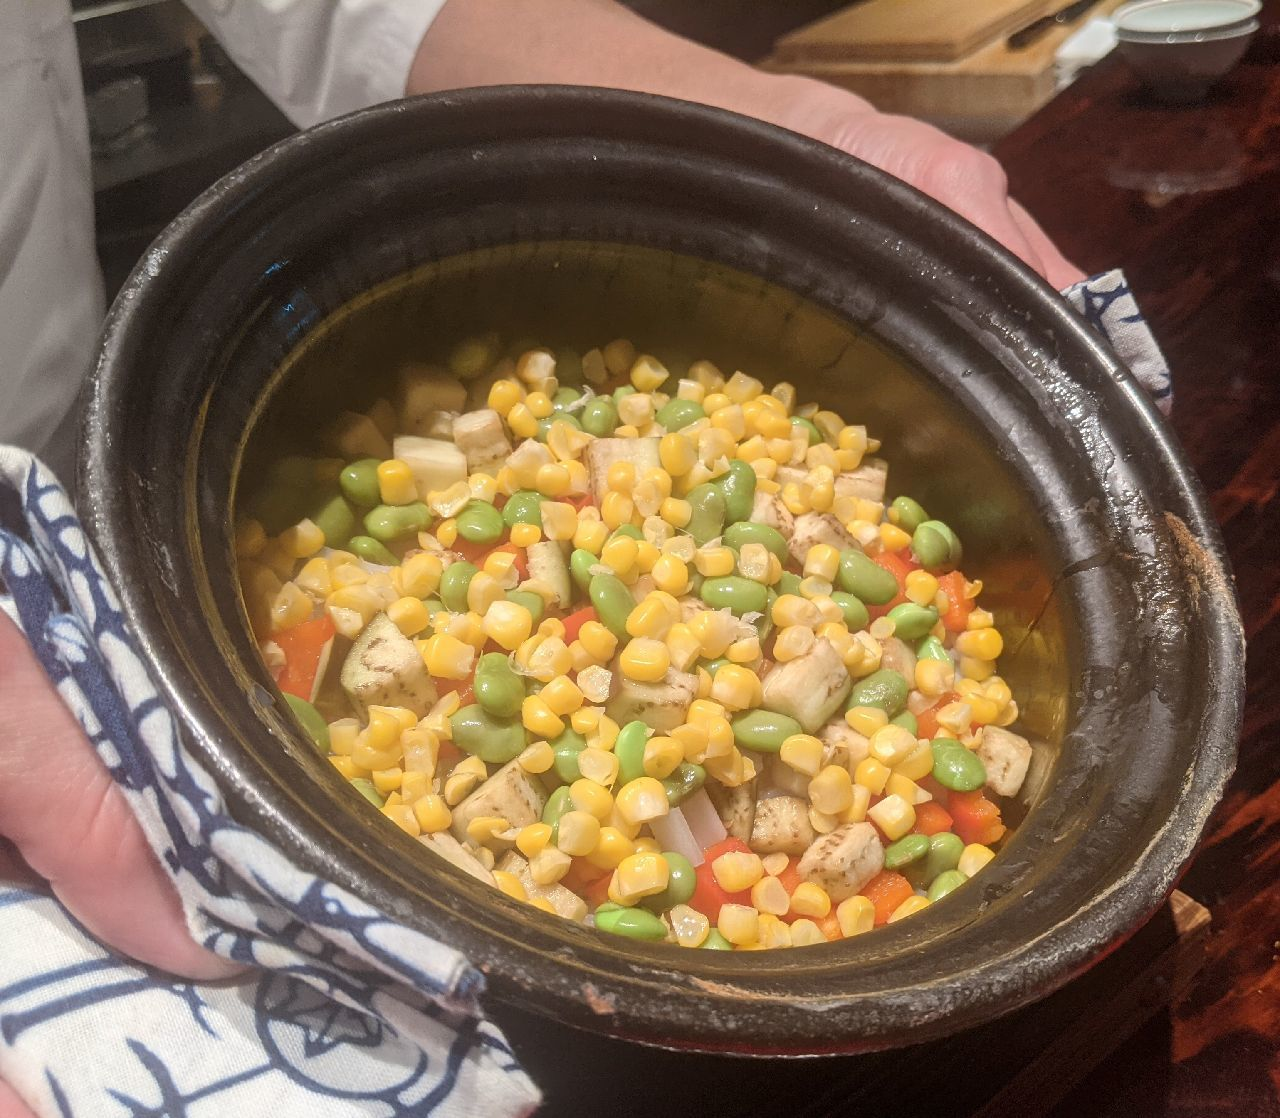 PXL_20210804_103153580夏野菜の炊き込みご飯